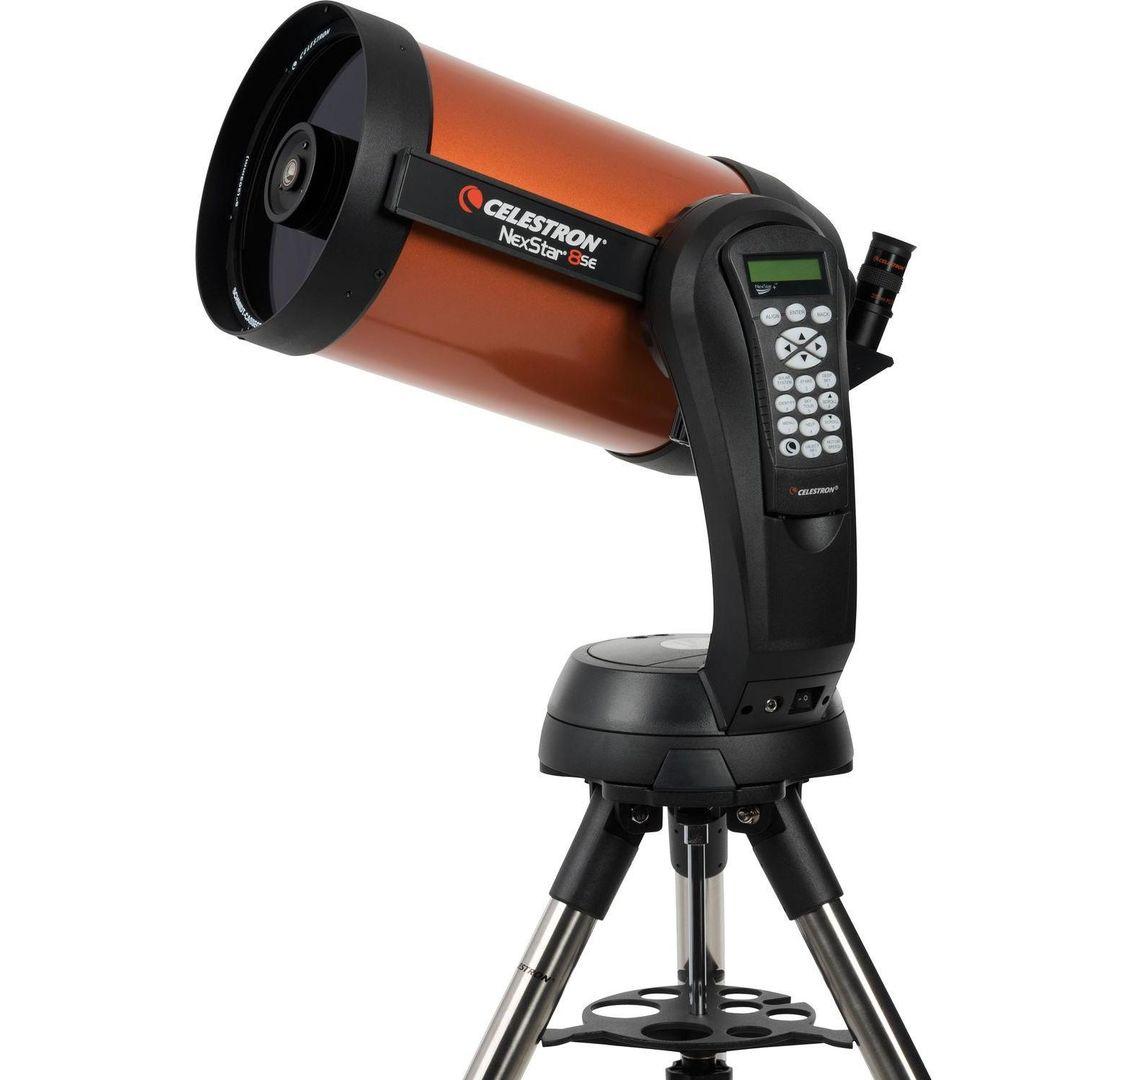 Buy Celestron Nexstar 8 Se Computerized Telescope in Dubai at cheap price